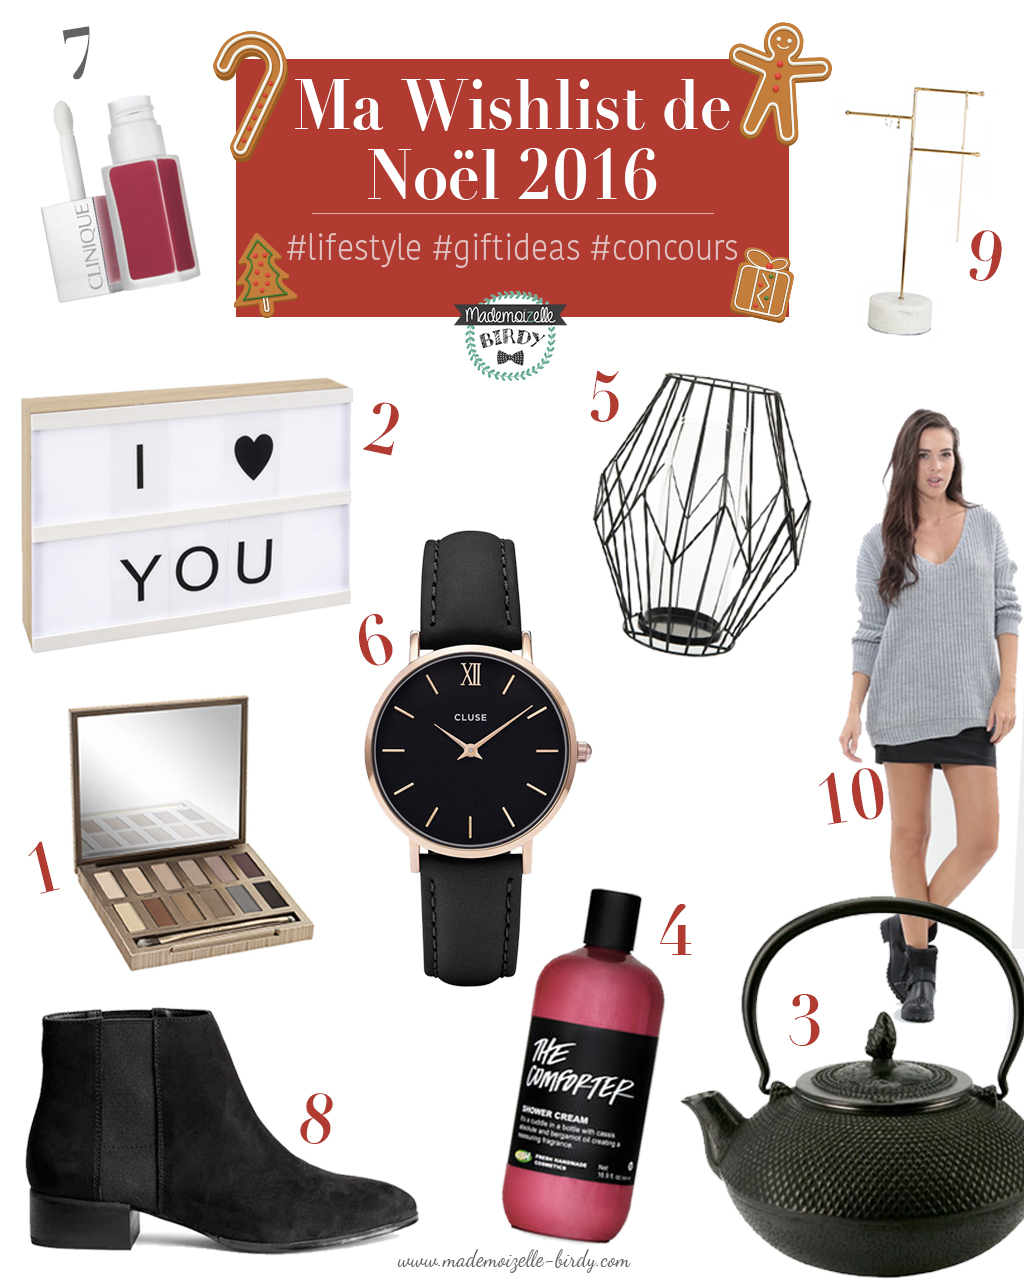 idee-cadeaux-noel-wishlist-noel-2016-cadeaux-pour-femme-02